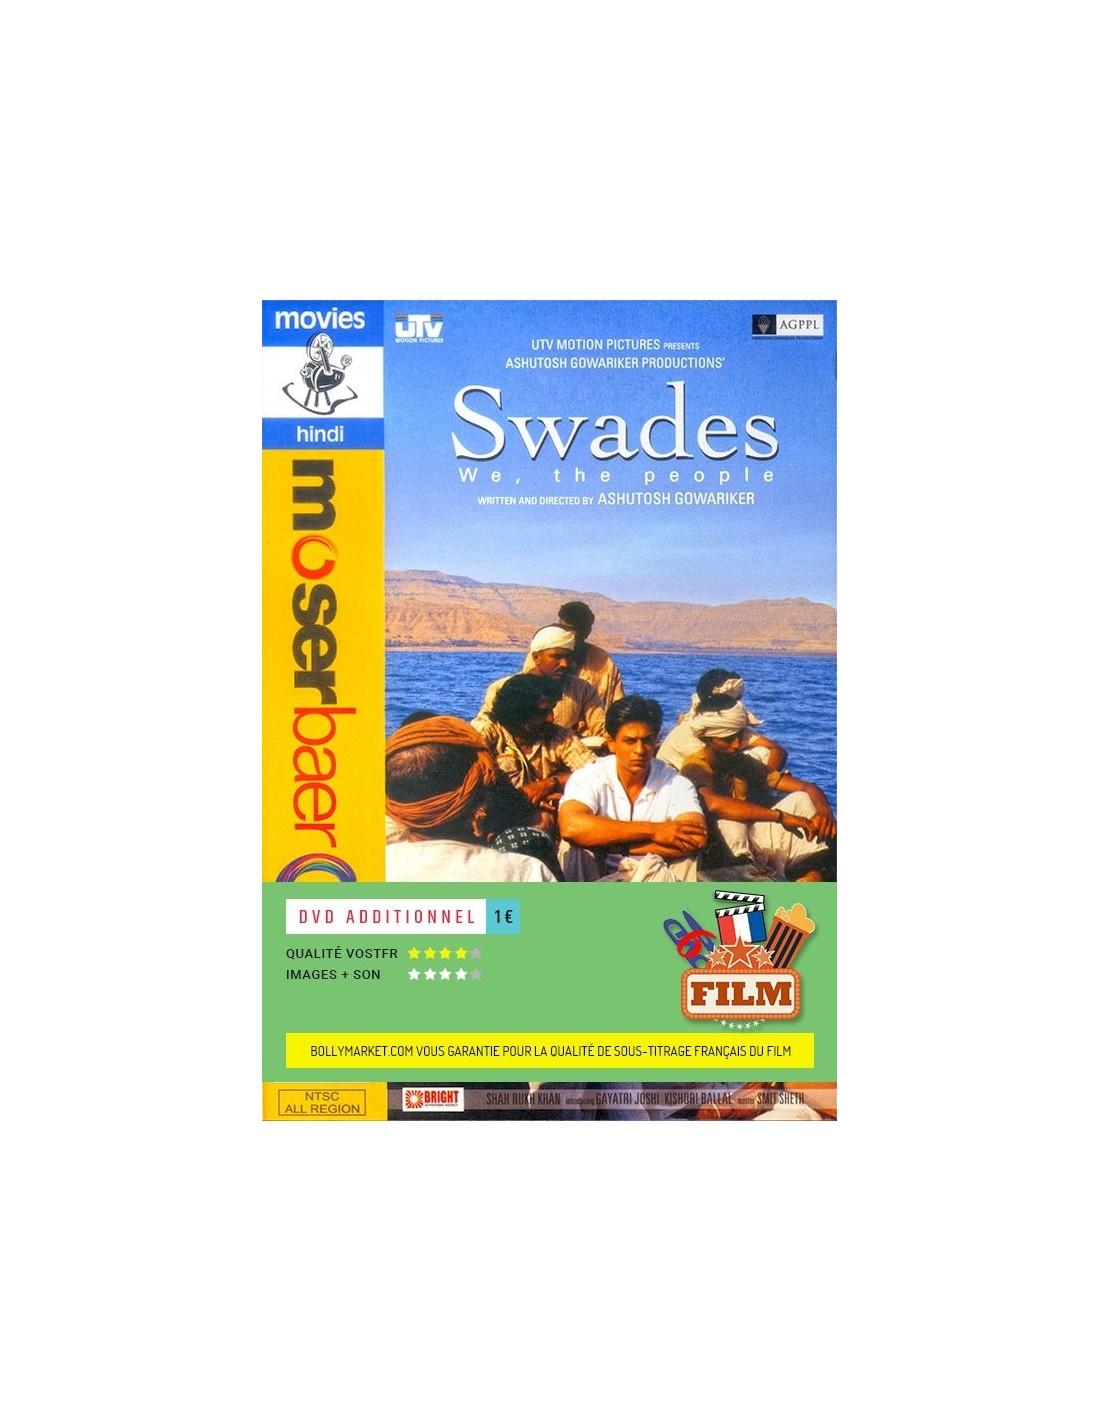 swades dvd disponible en fran ais dvdfr inclure film sous titr fran ais 1. Black Bedroom Furniture Sets. Home Design Ideas